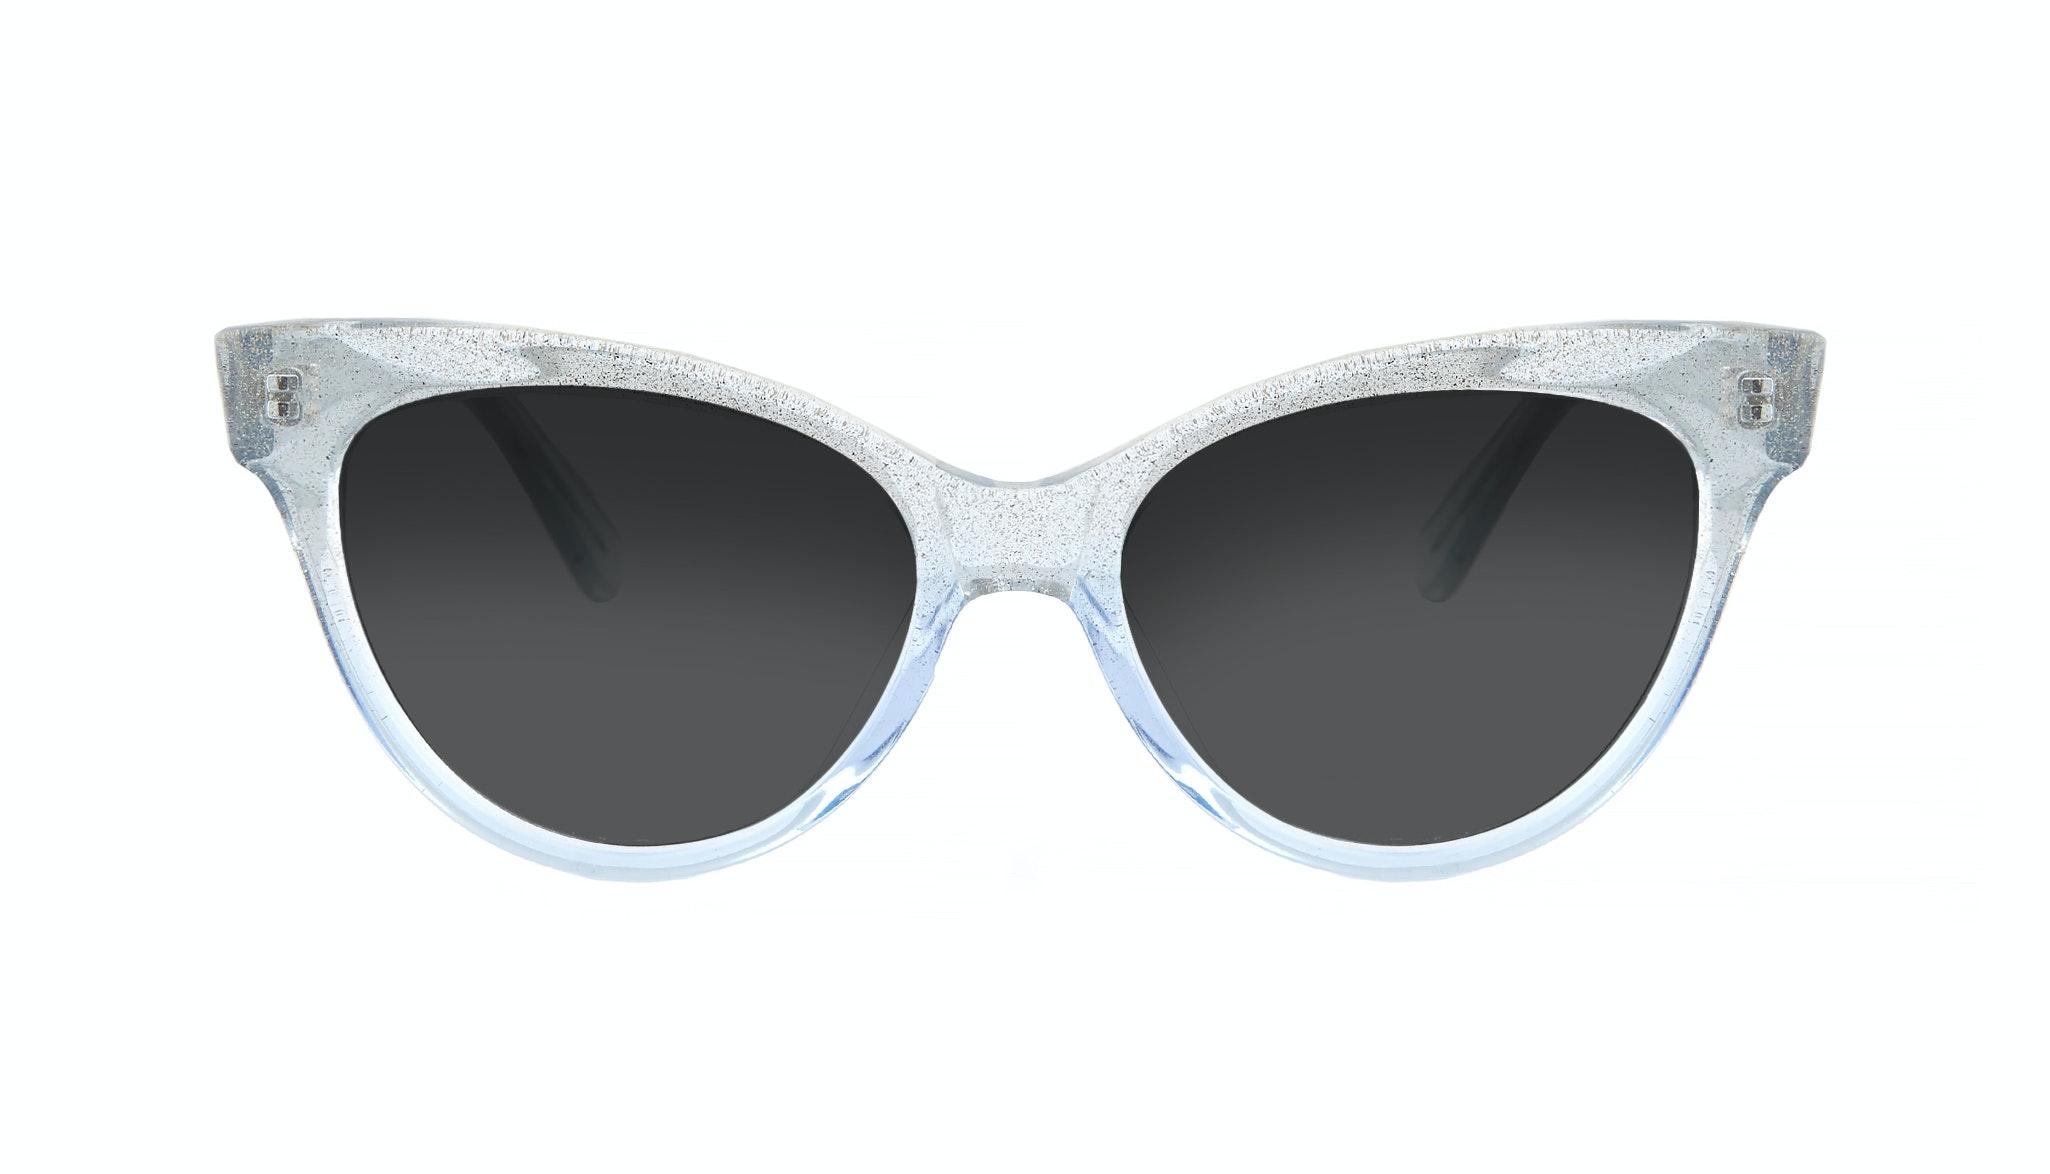 Affordable Fashion Glasses Cat Eye Square Sunglasses Women SkunkBoy Larissa Lake